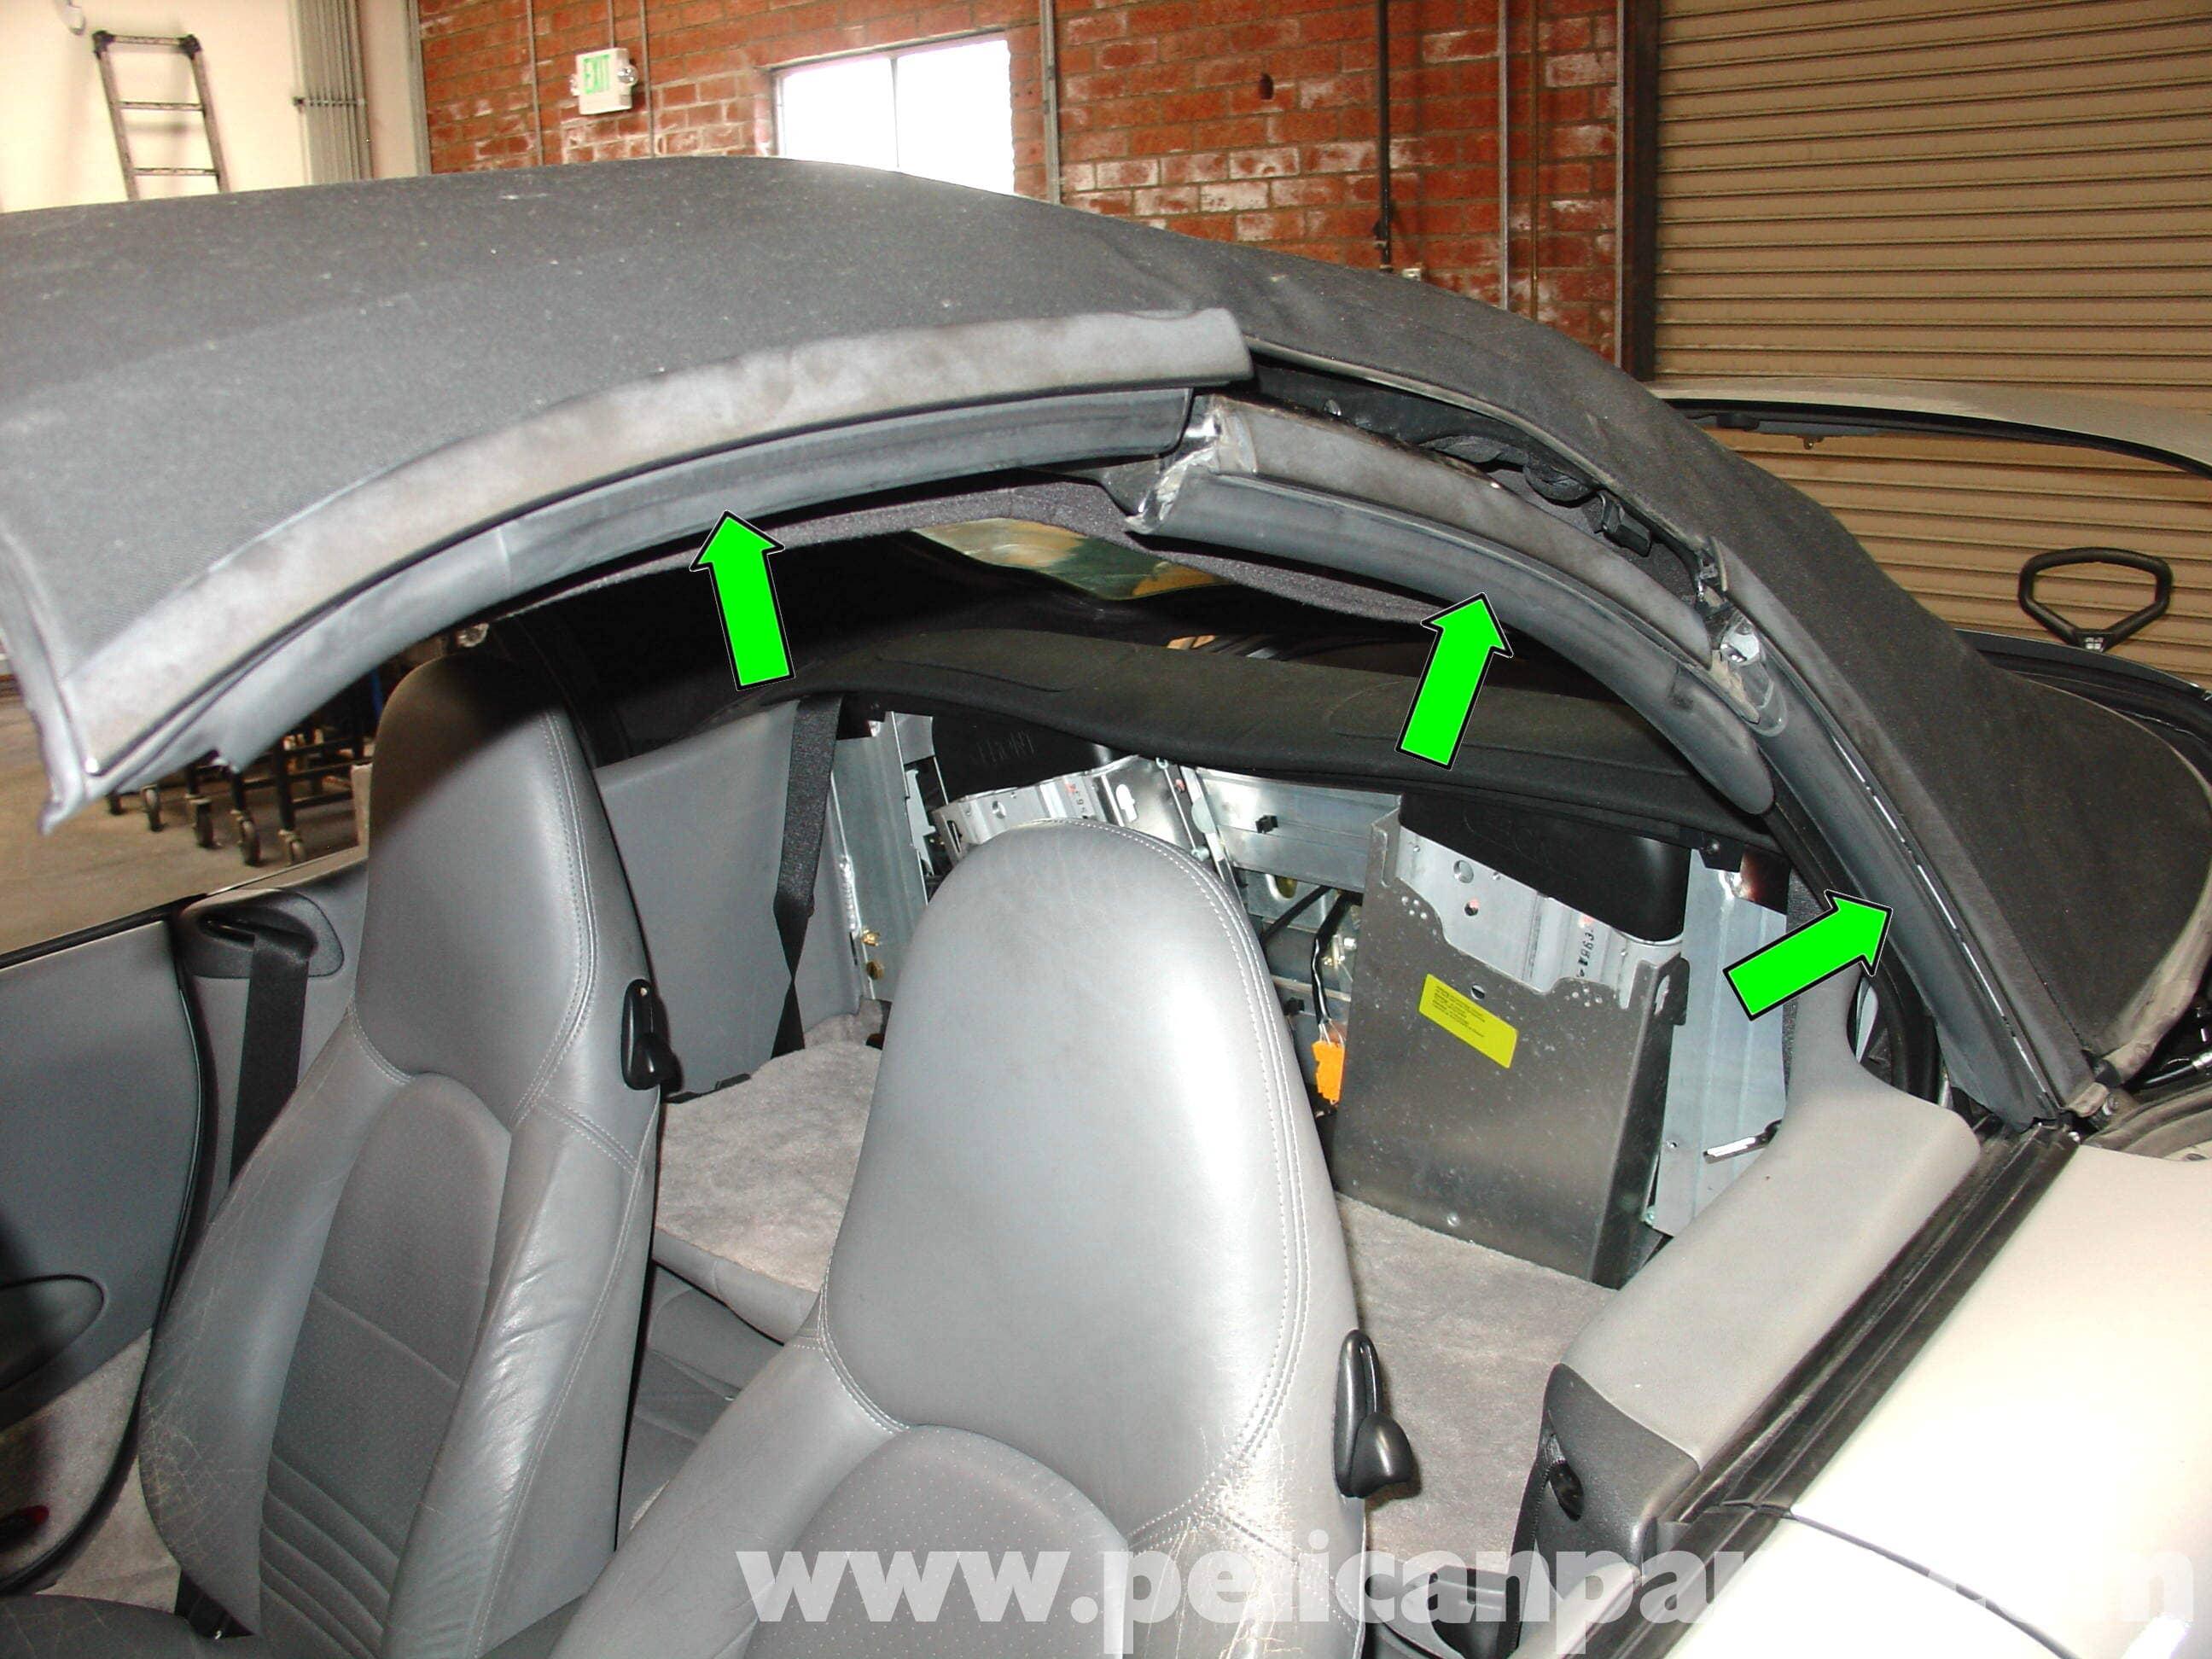 2012 Eos Fuse Box Porsche 911 Carrera Common Convertible Top Problem Repair